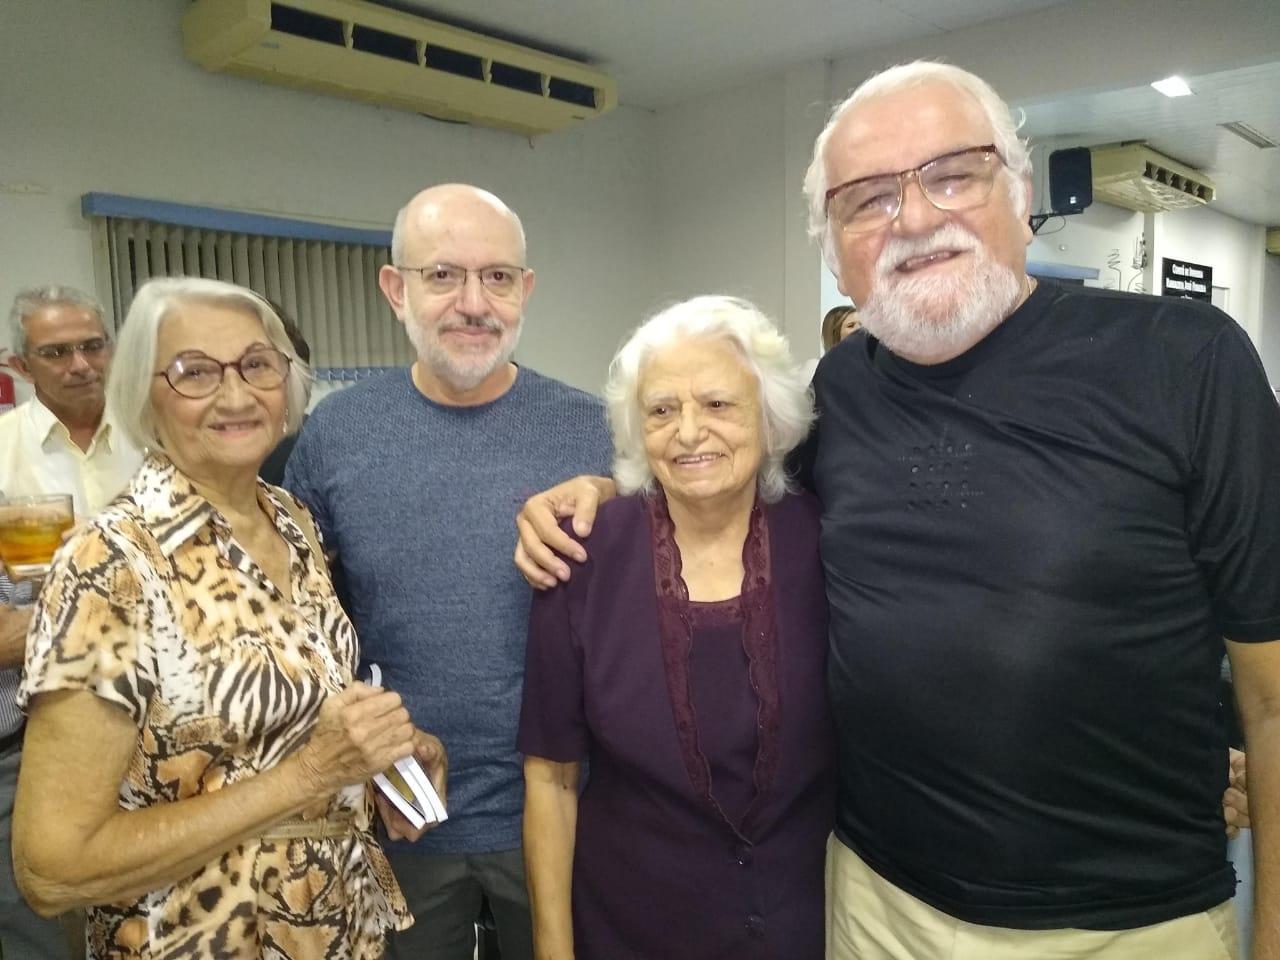 WhatsApp Image 2021 04 28 at 19.07.32 - Luto em Cajazeiras: morre Dona Joaninha Rolim, viúva do Dr. Sabino Rolim